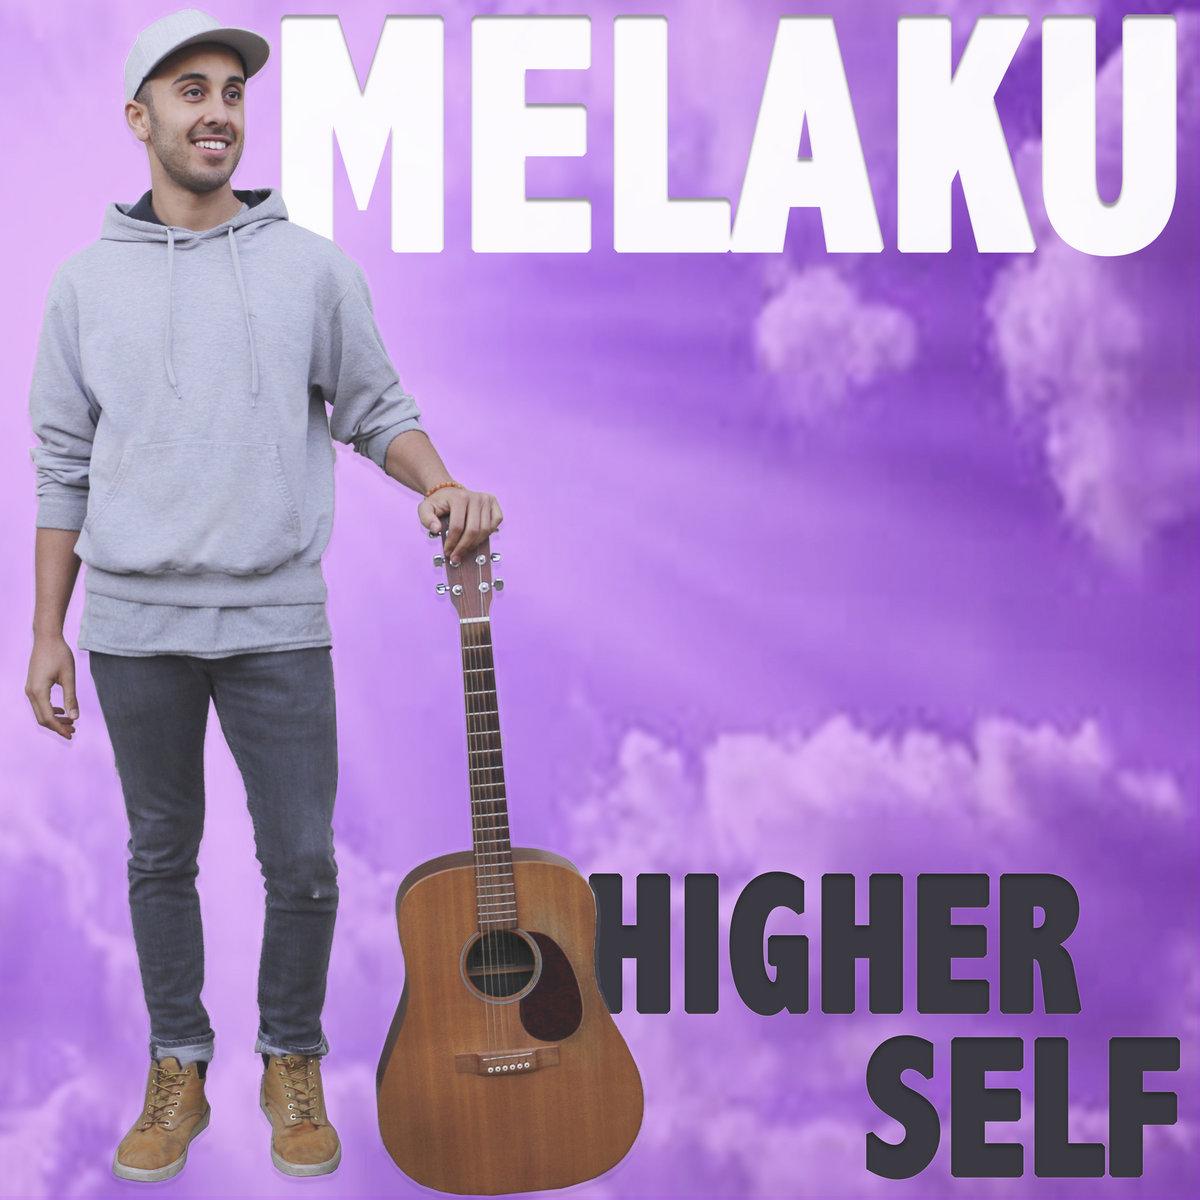 Higher Self by Melaku